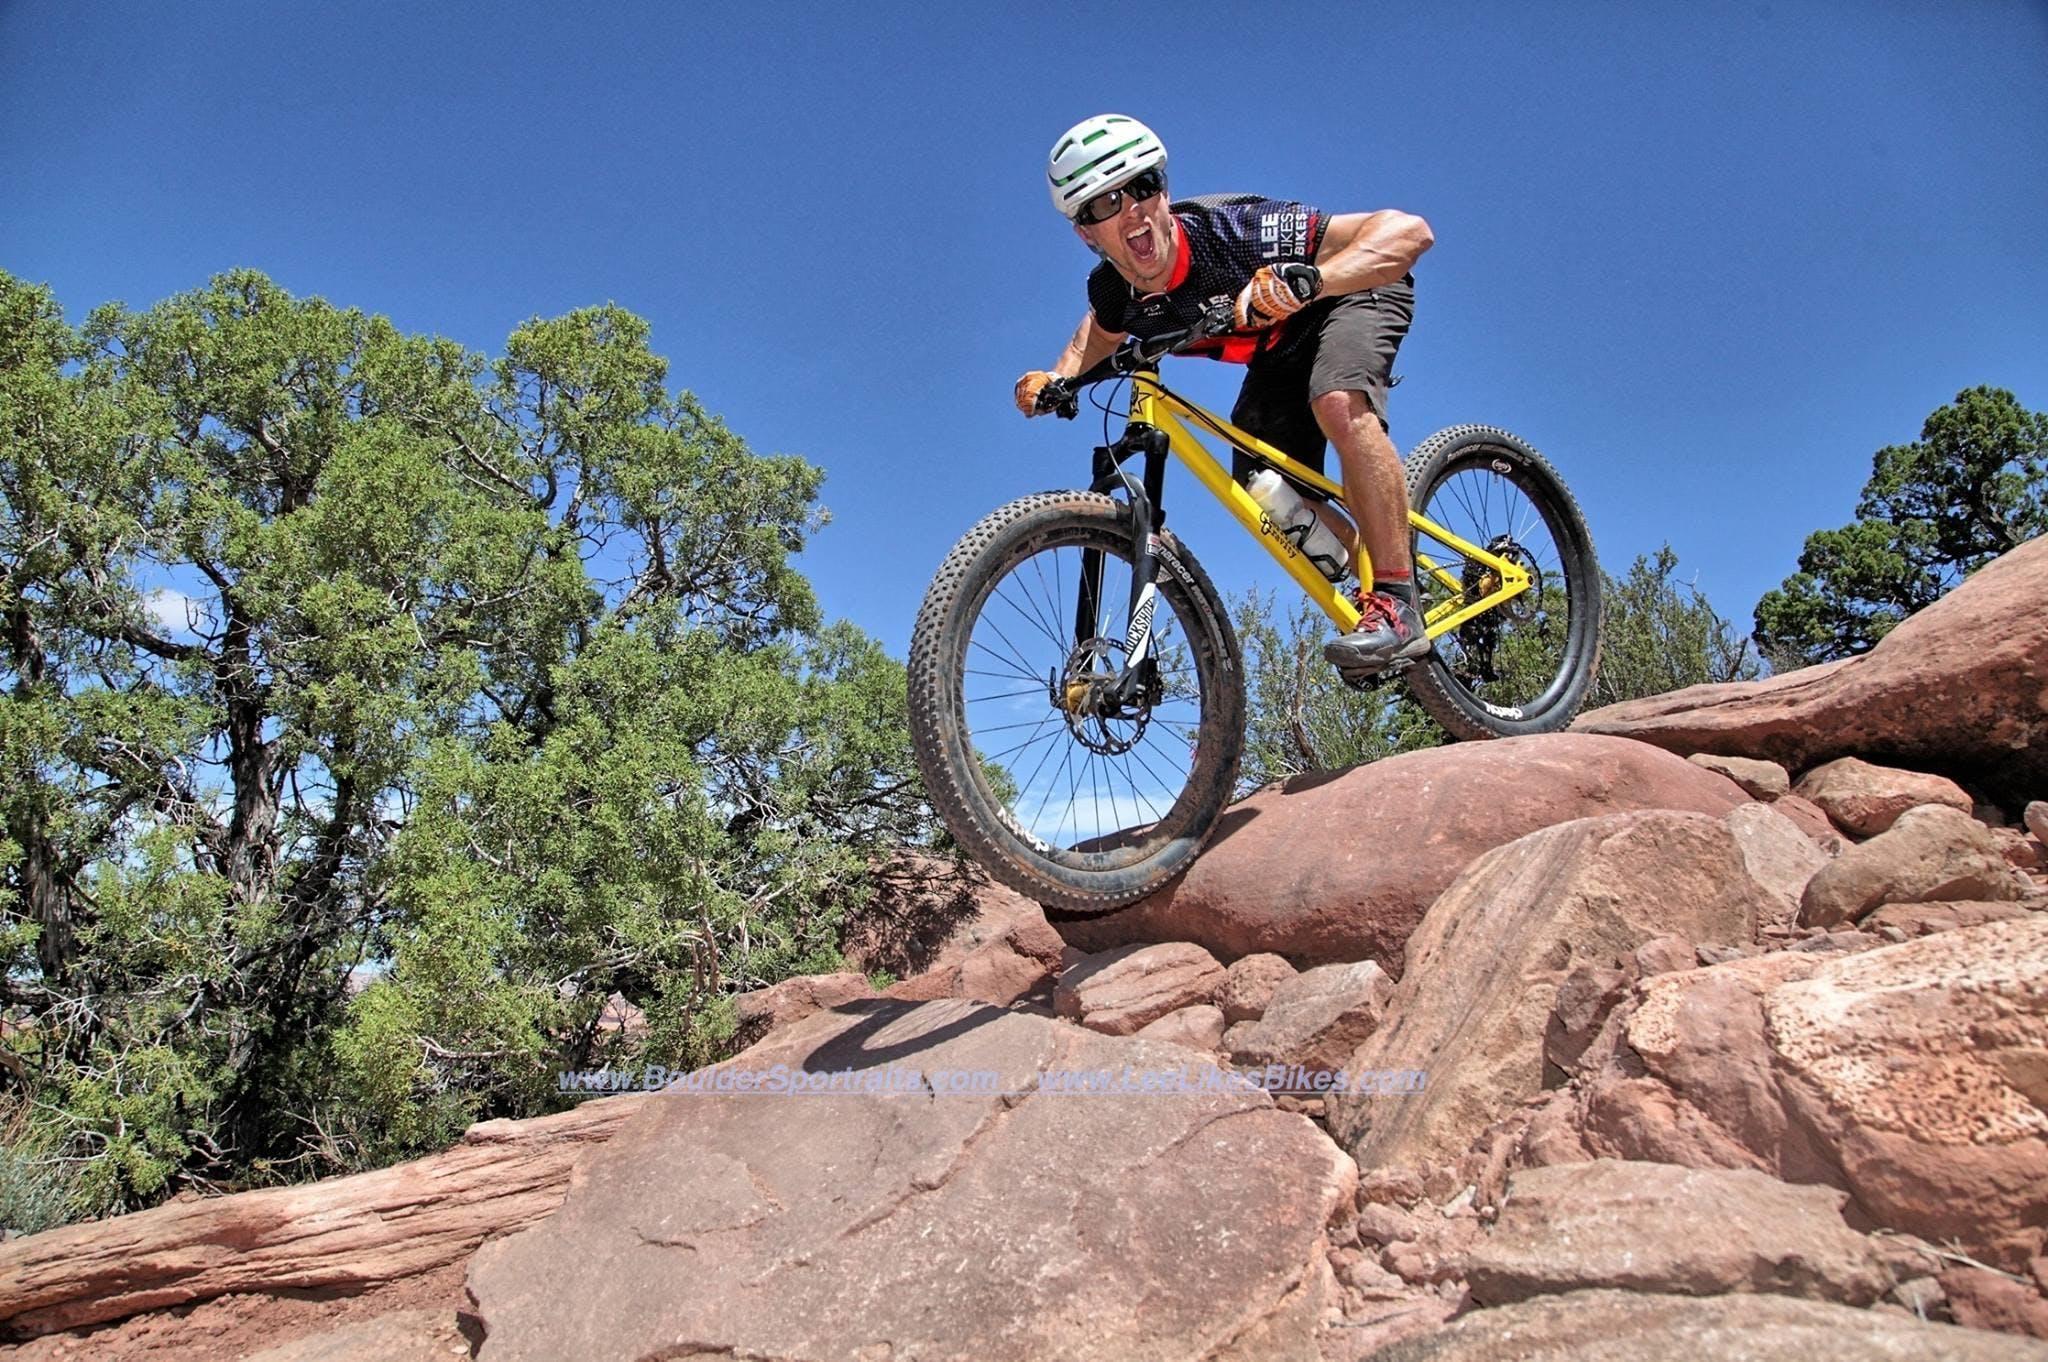 24b7bb80974 Posse Grounds Bike Park : 2 Day RideLogic/LeeLikesBikes MTB Skills ...